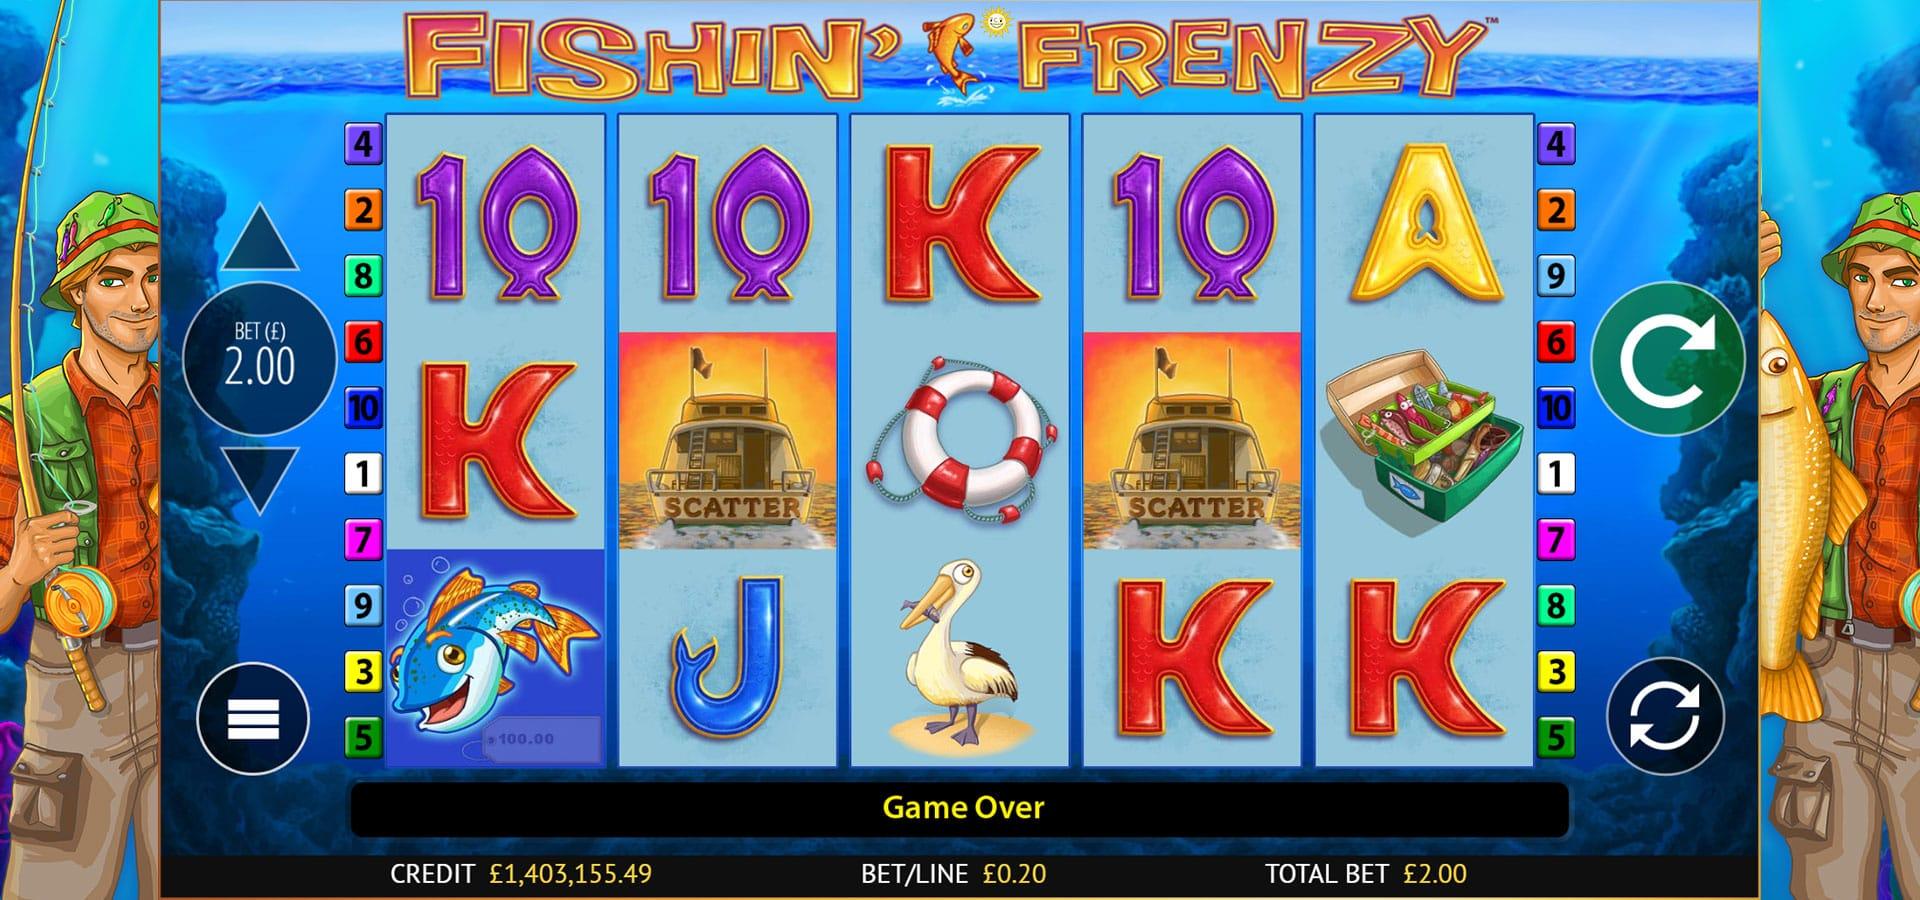 Fishin' Frenzy Free Slots